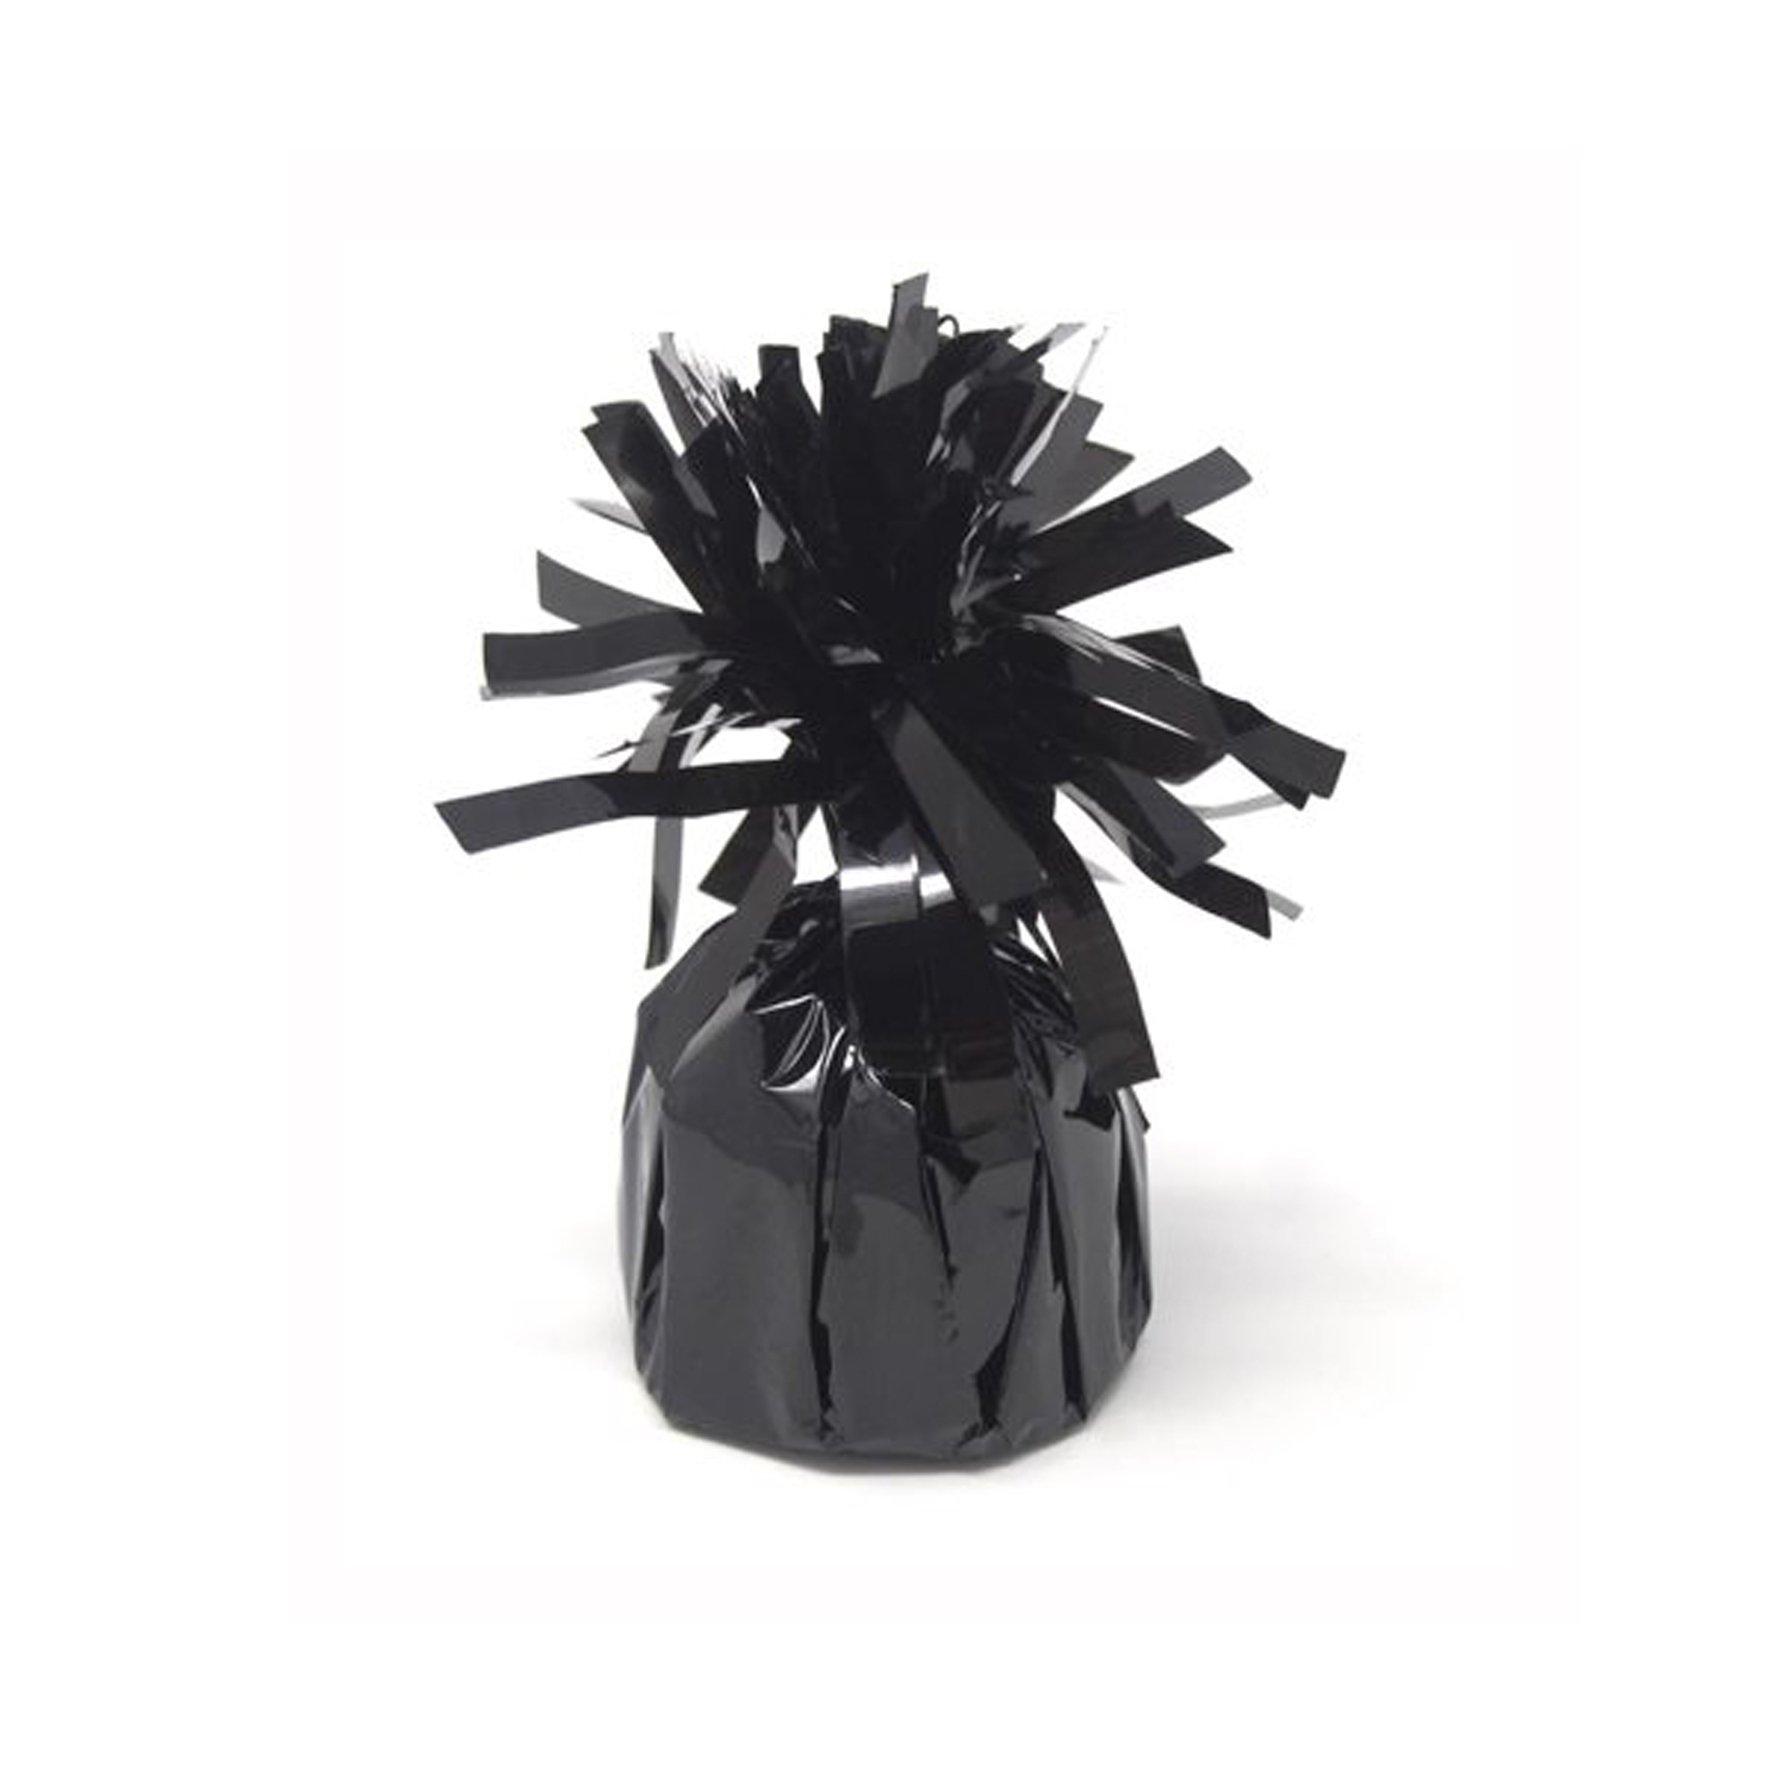 BUY ME / NEW ITEM $1.50 each 6oz Black Balloon Weight